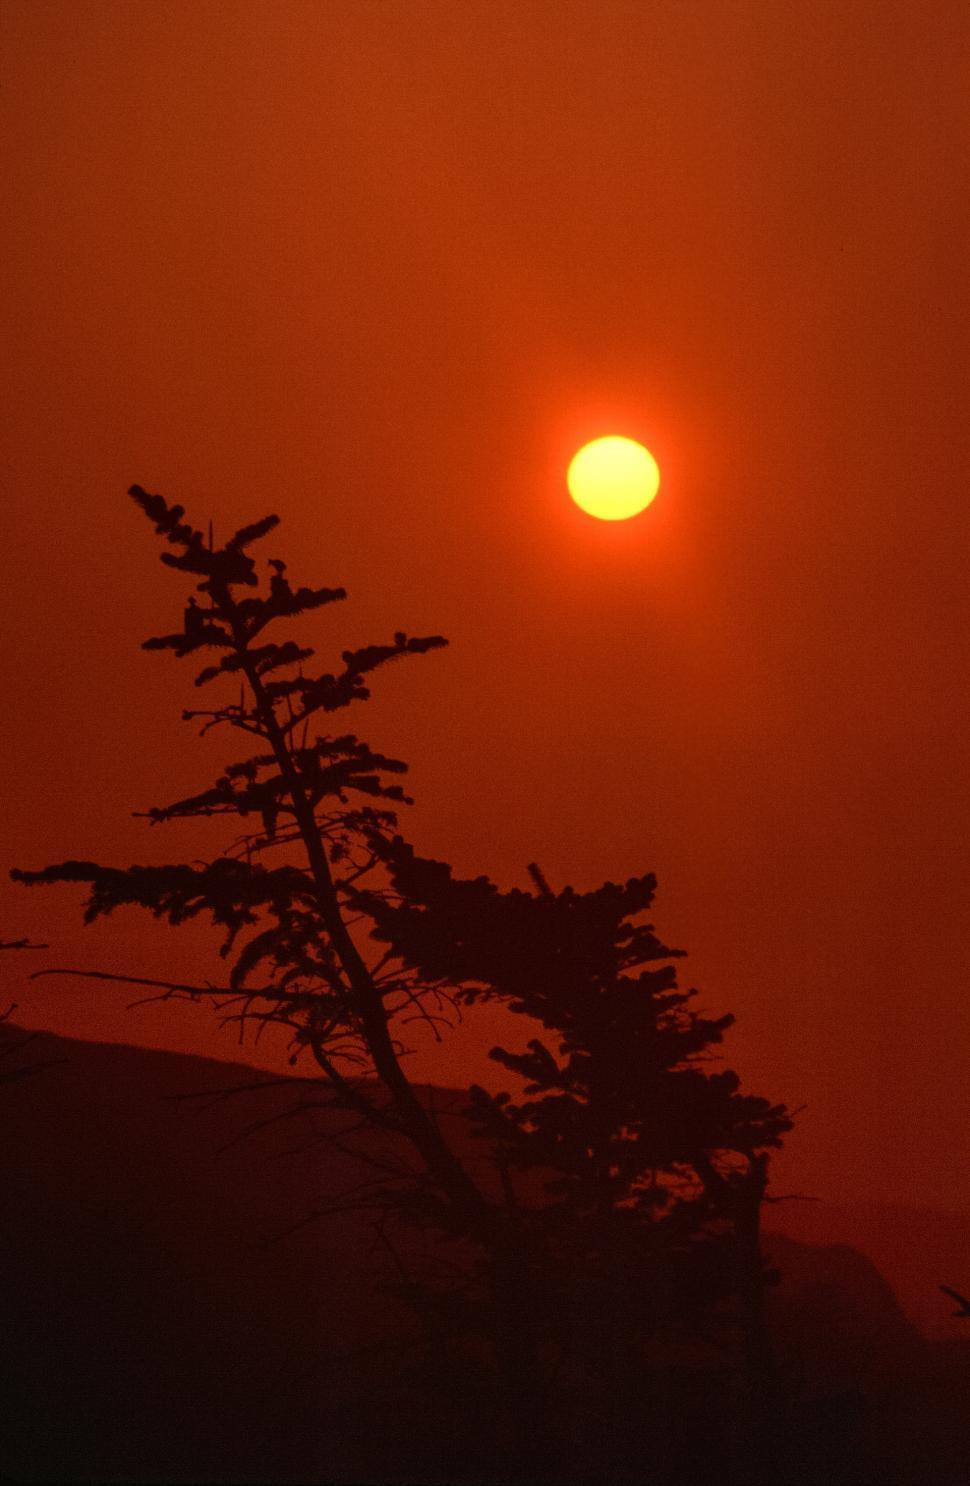 Download Free Stock HD Photo of Deep orange sunset Online